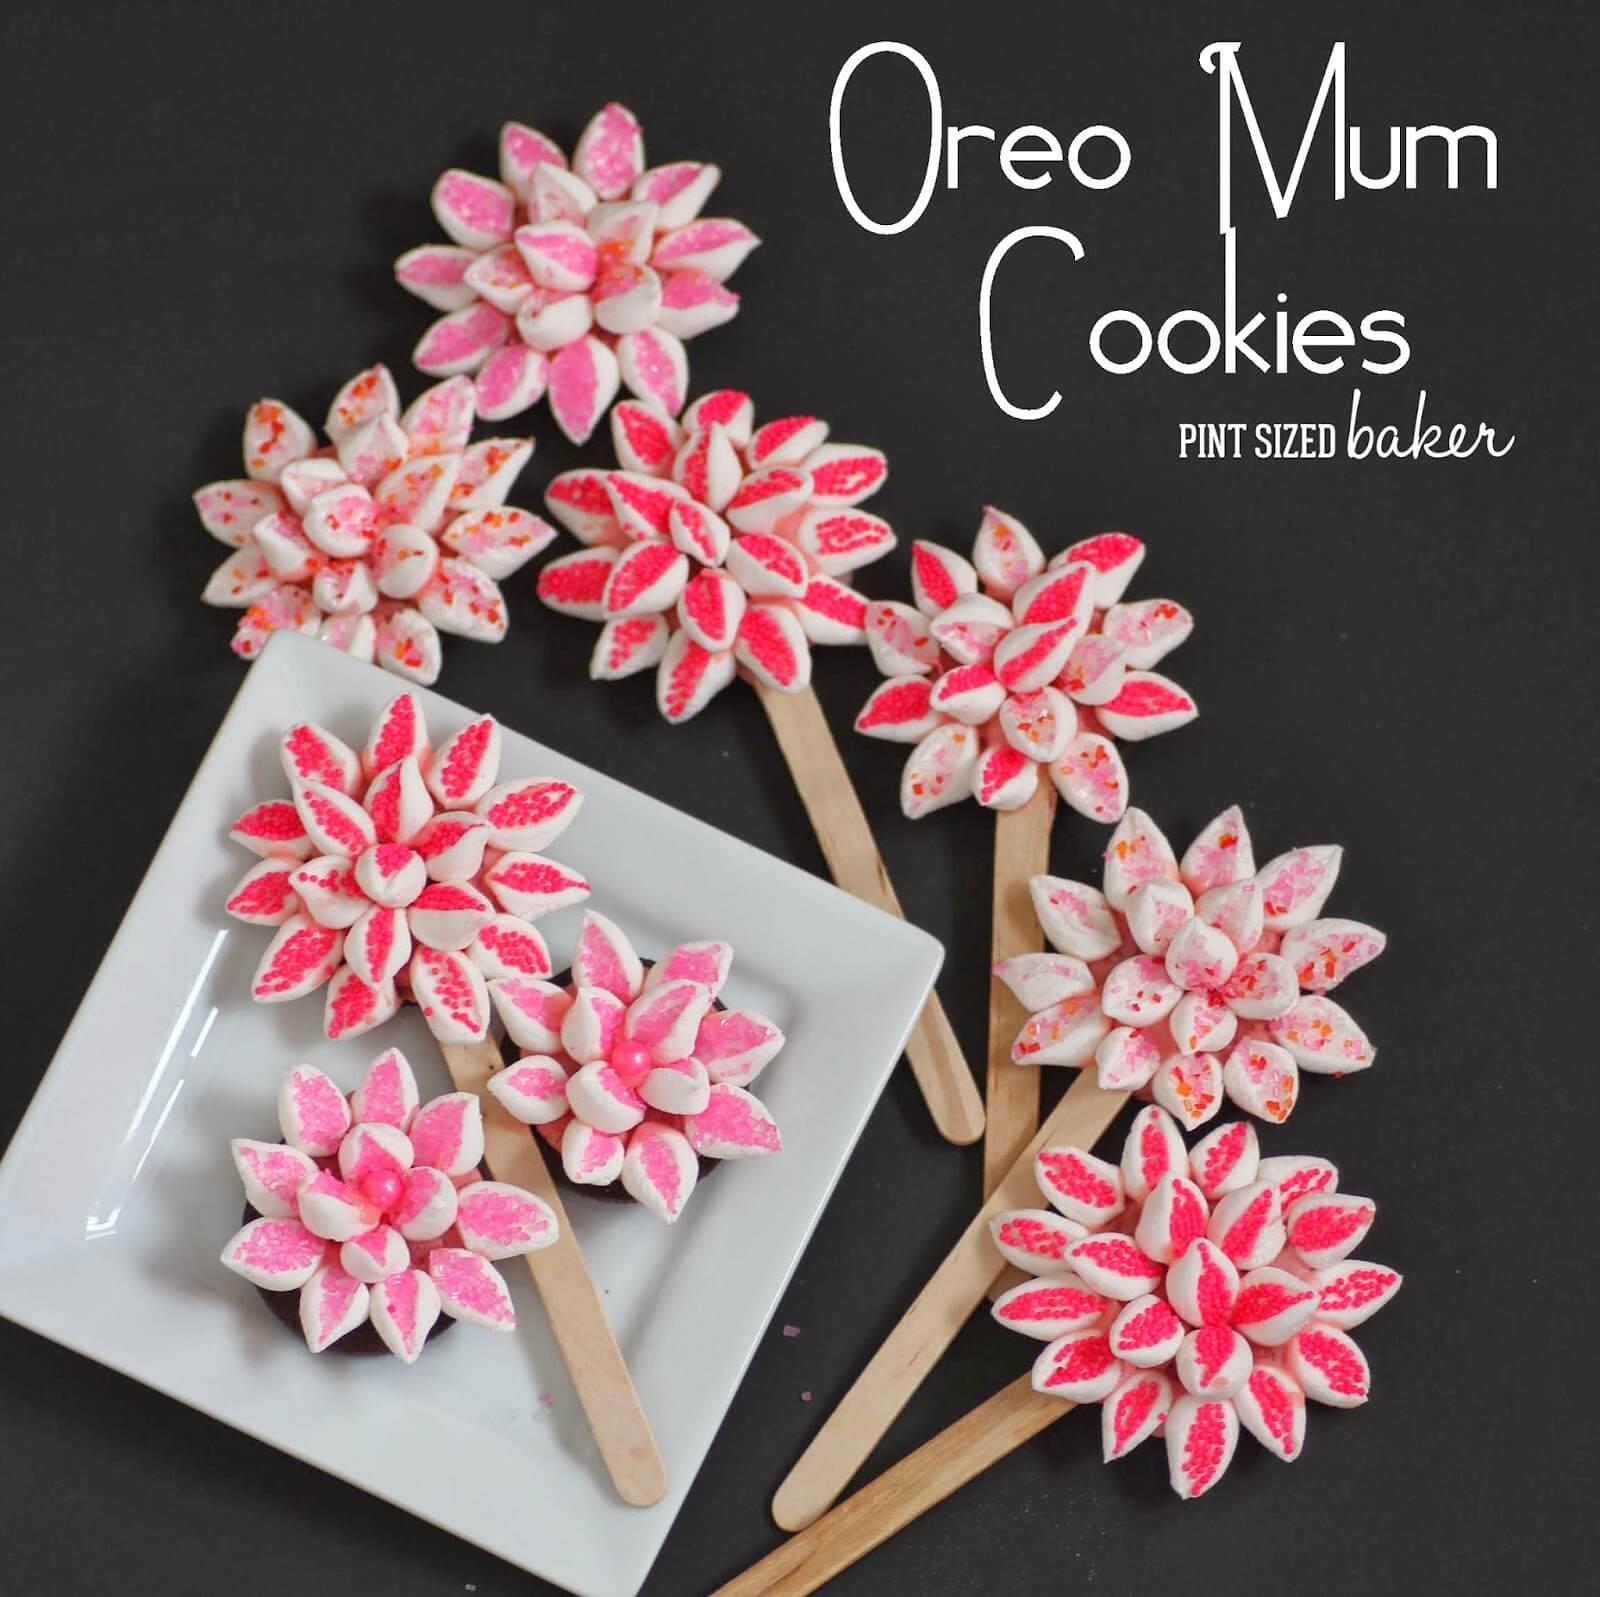 Oreo Mum Cookie Flowers